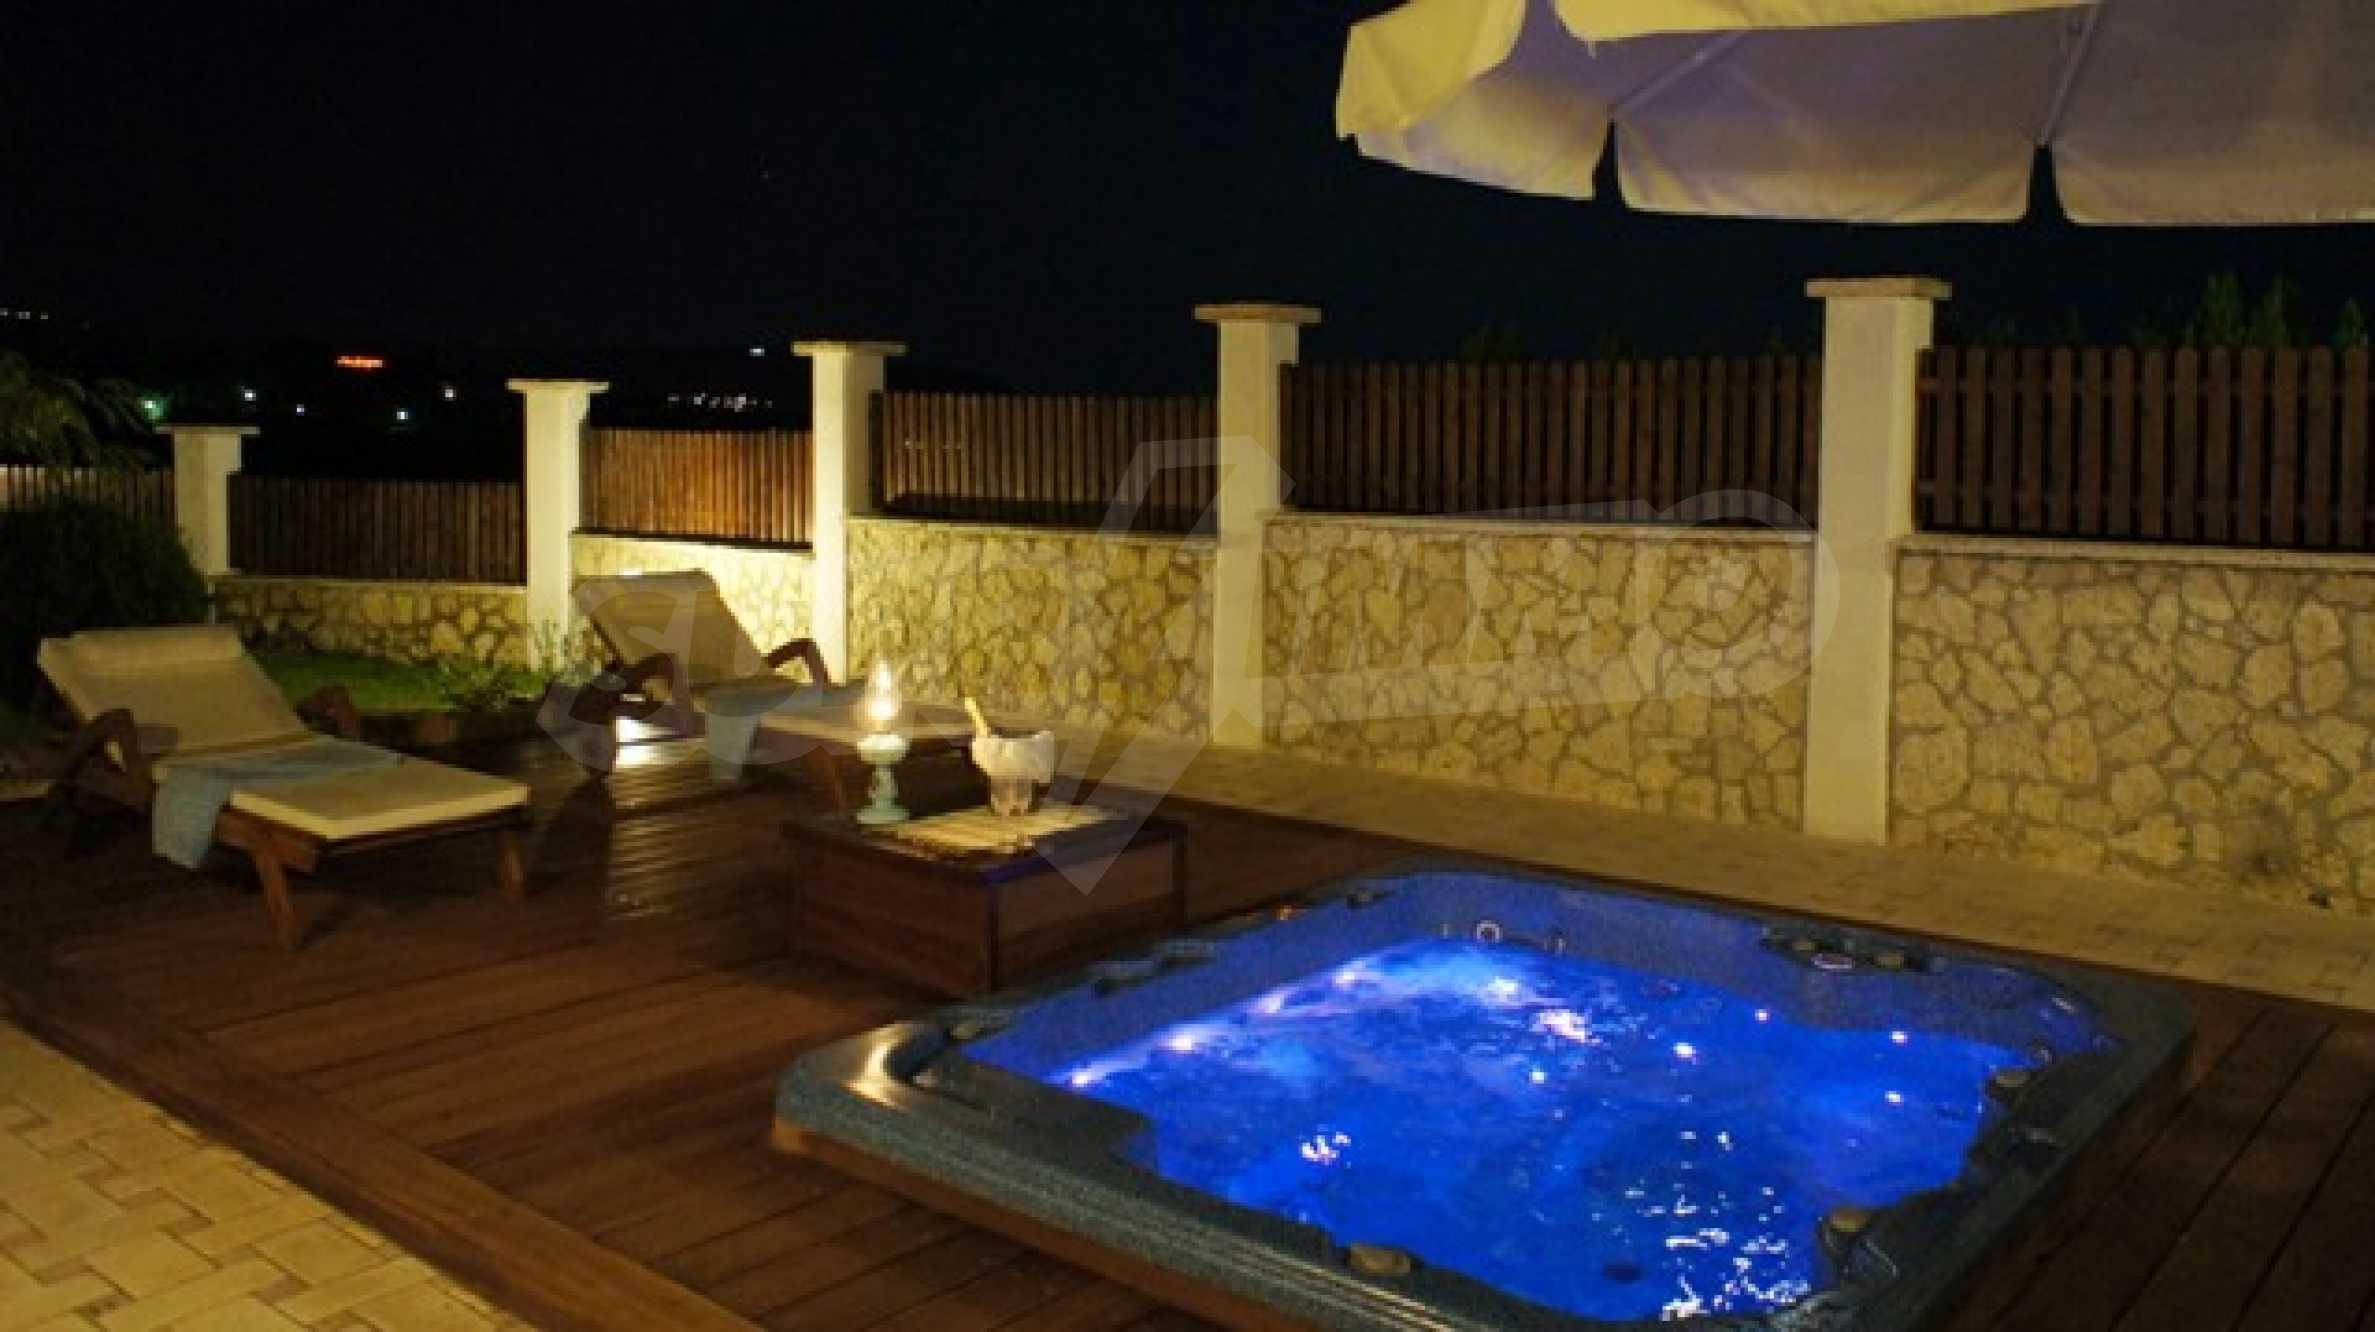 The Mediterranean style - a sense of luxury 58